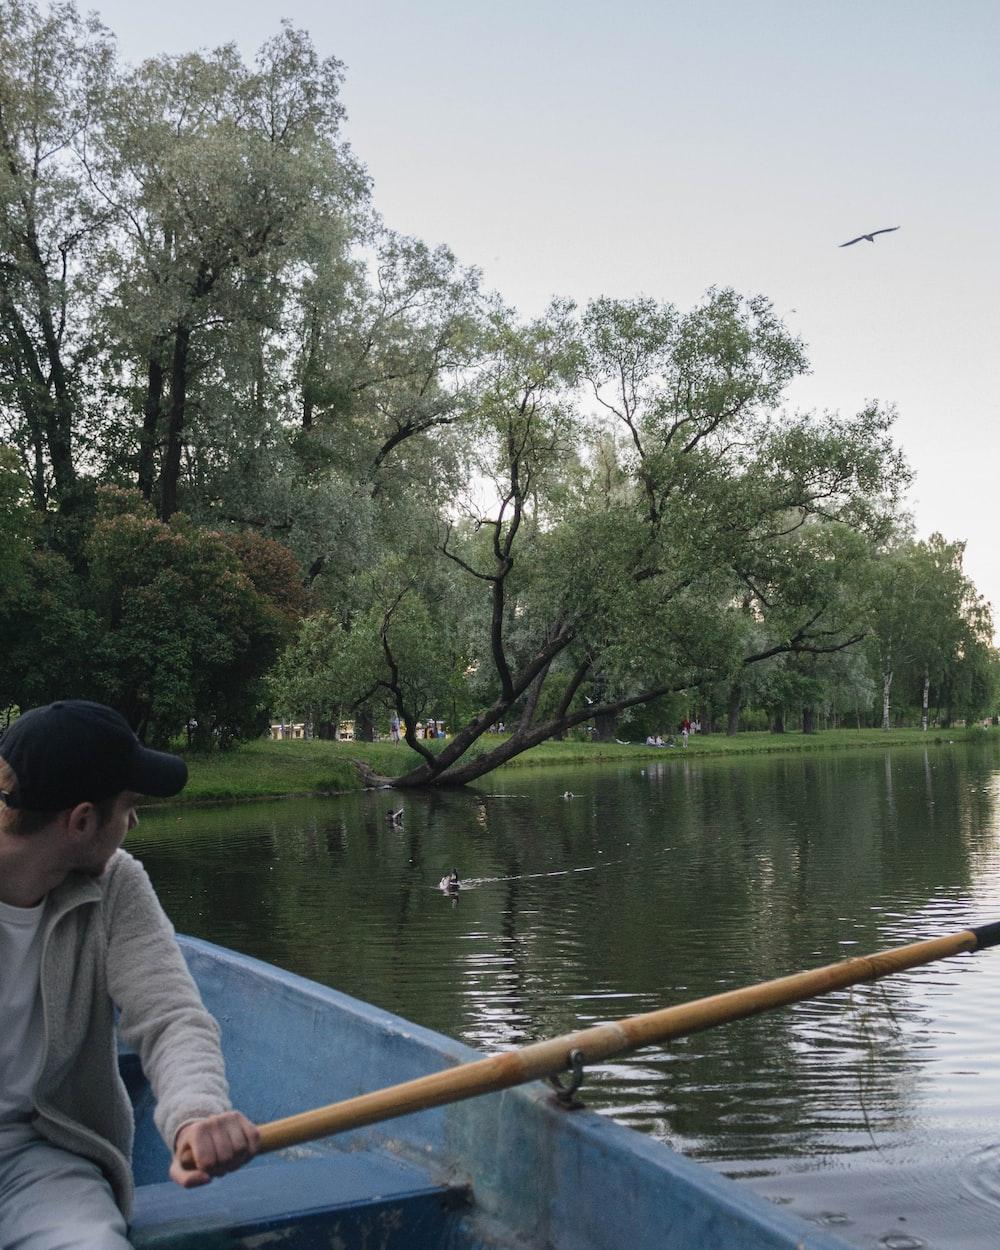 man in white shirt sitting on boat during daytime